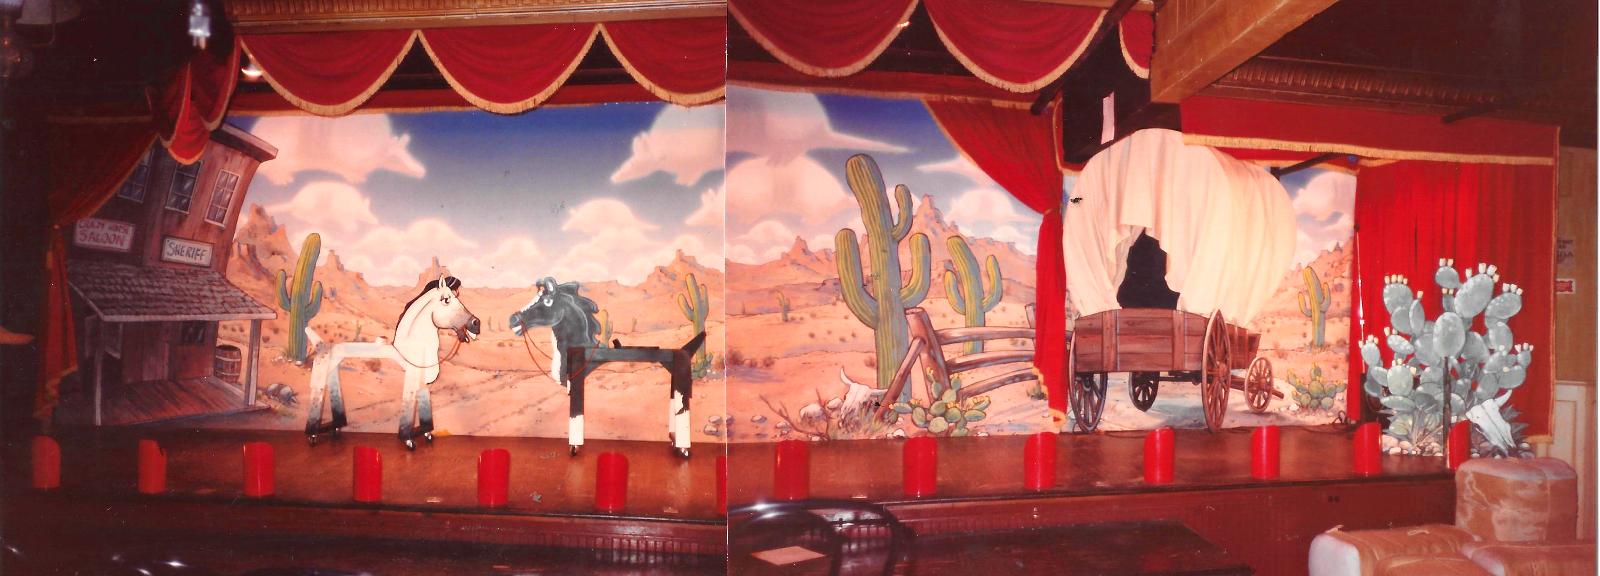 Six Flags Crazy Horse Saloon; backdrop a